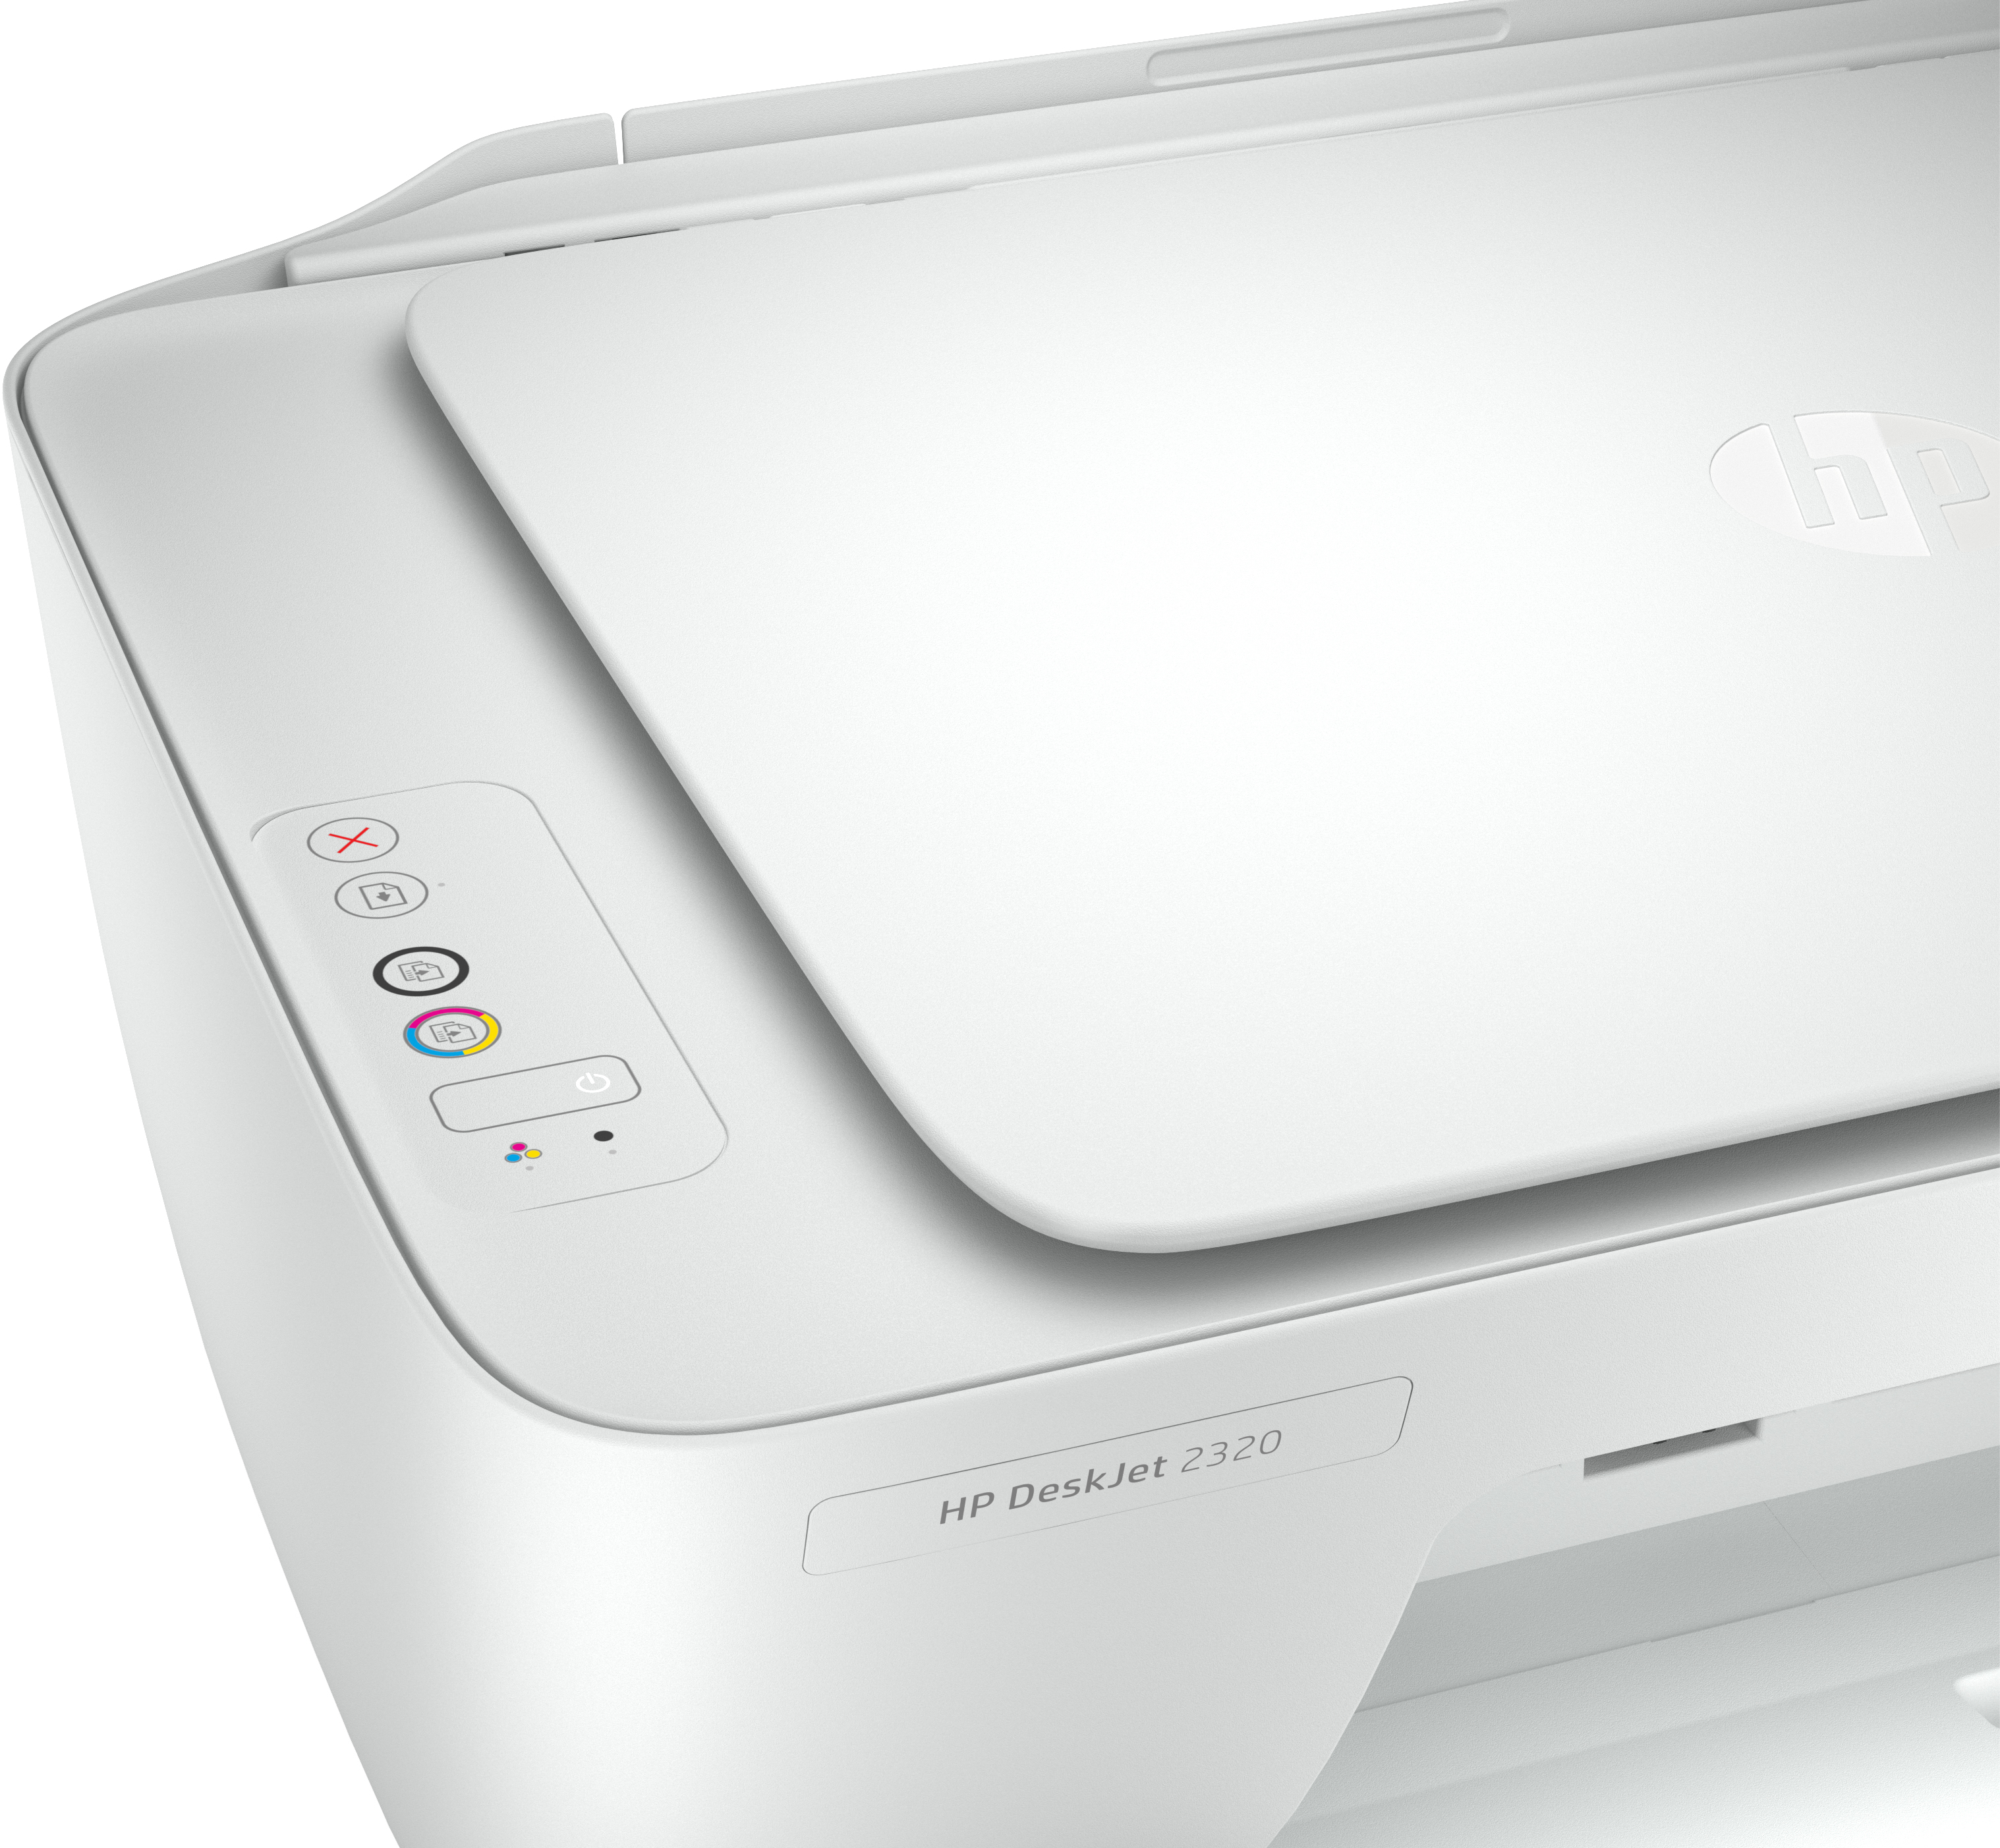 HP DeskJet 2320 Inktjet, Print/Copy/Scan, USB, HP305(XL) inkt